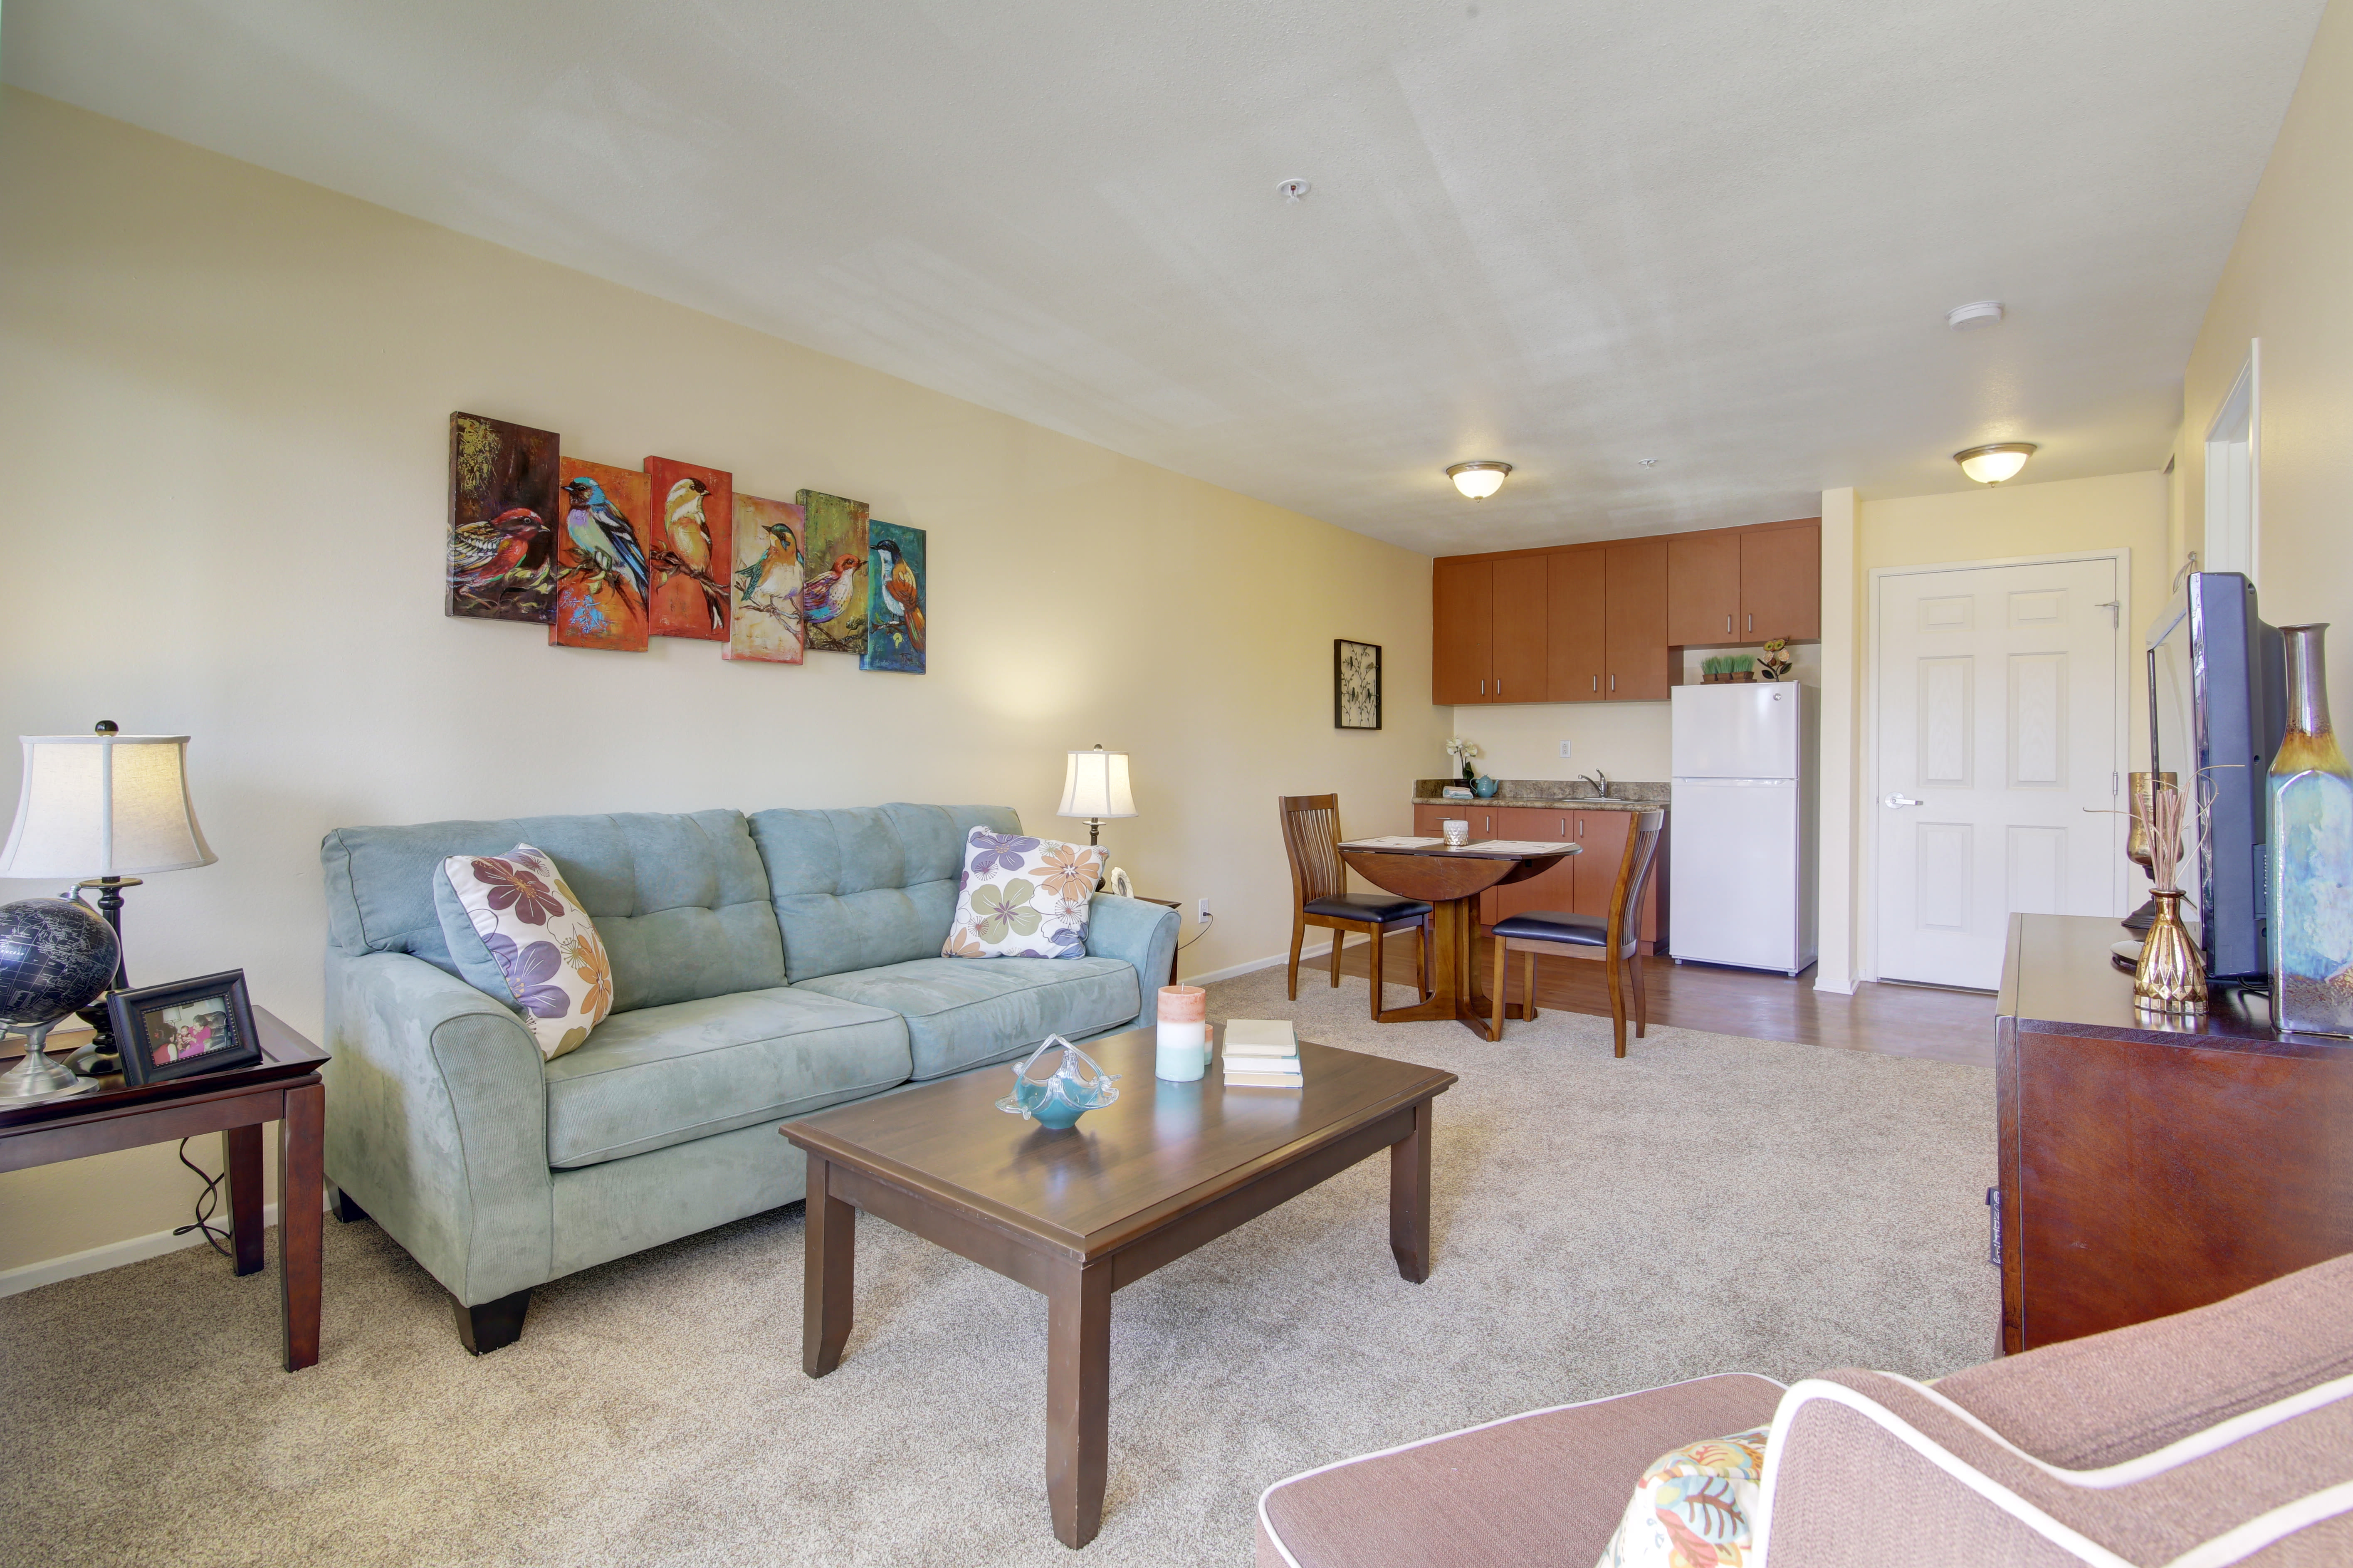 Living room at Citrus Place in Riverside, California